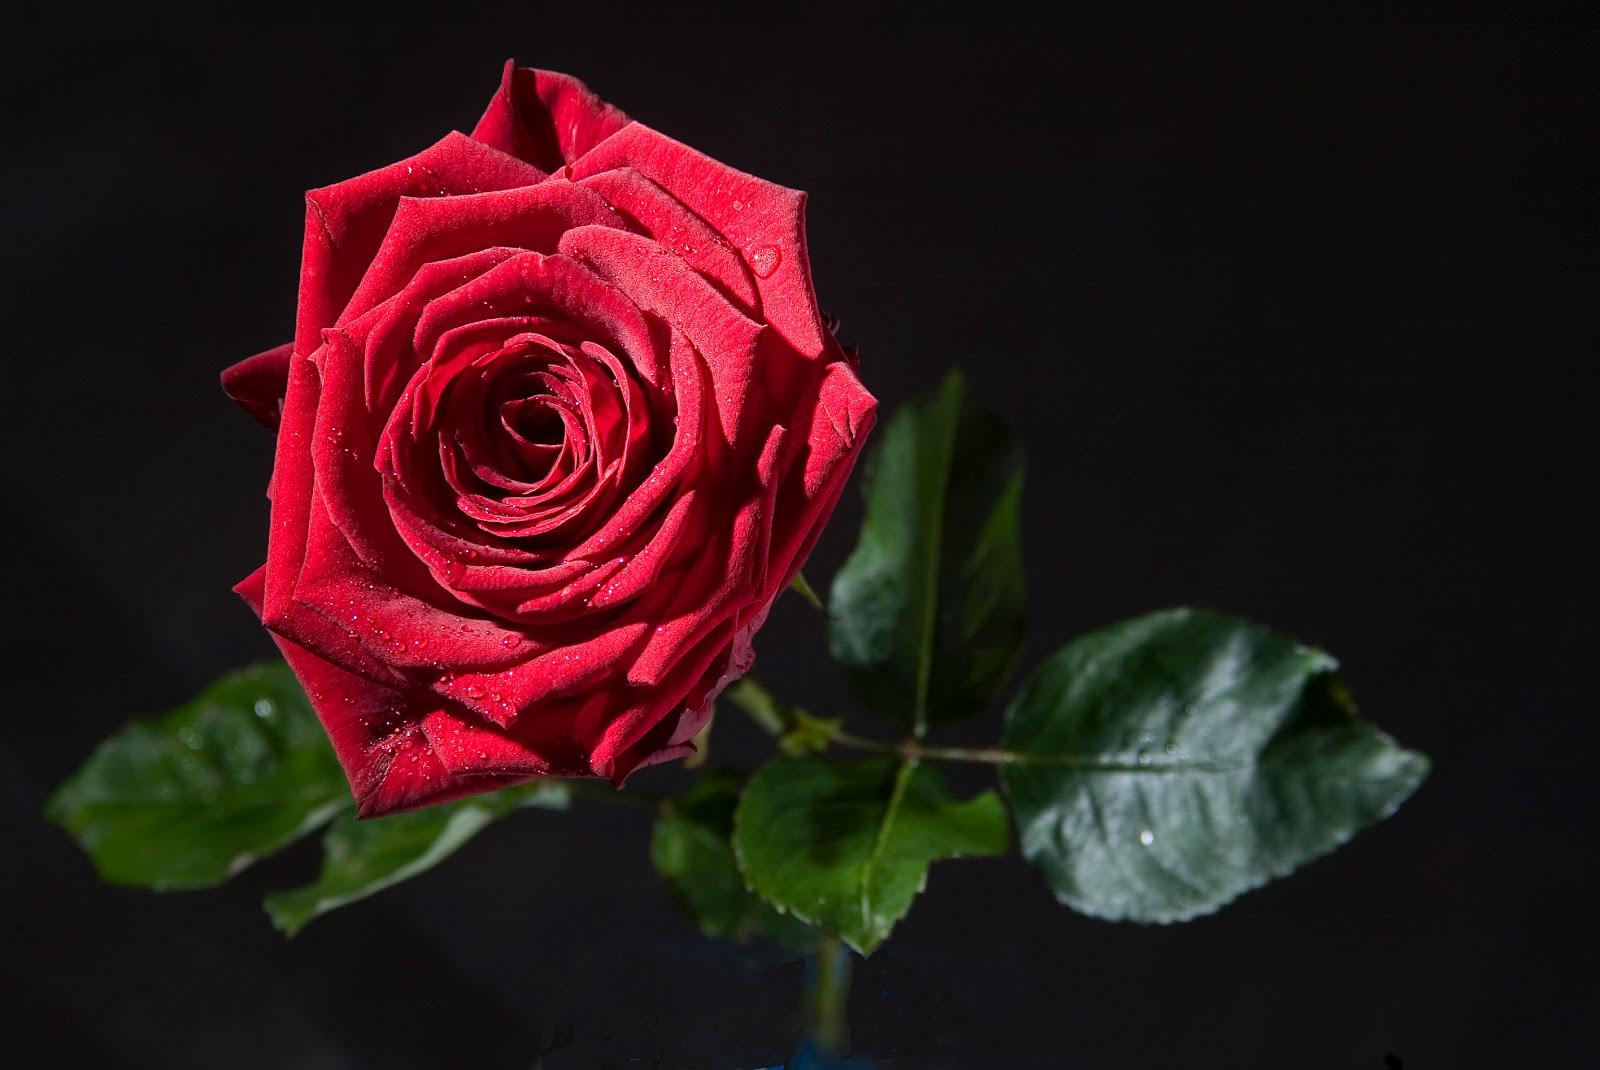 Rose of Tralee 2011